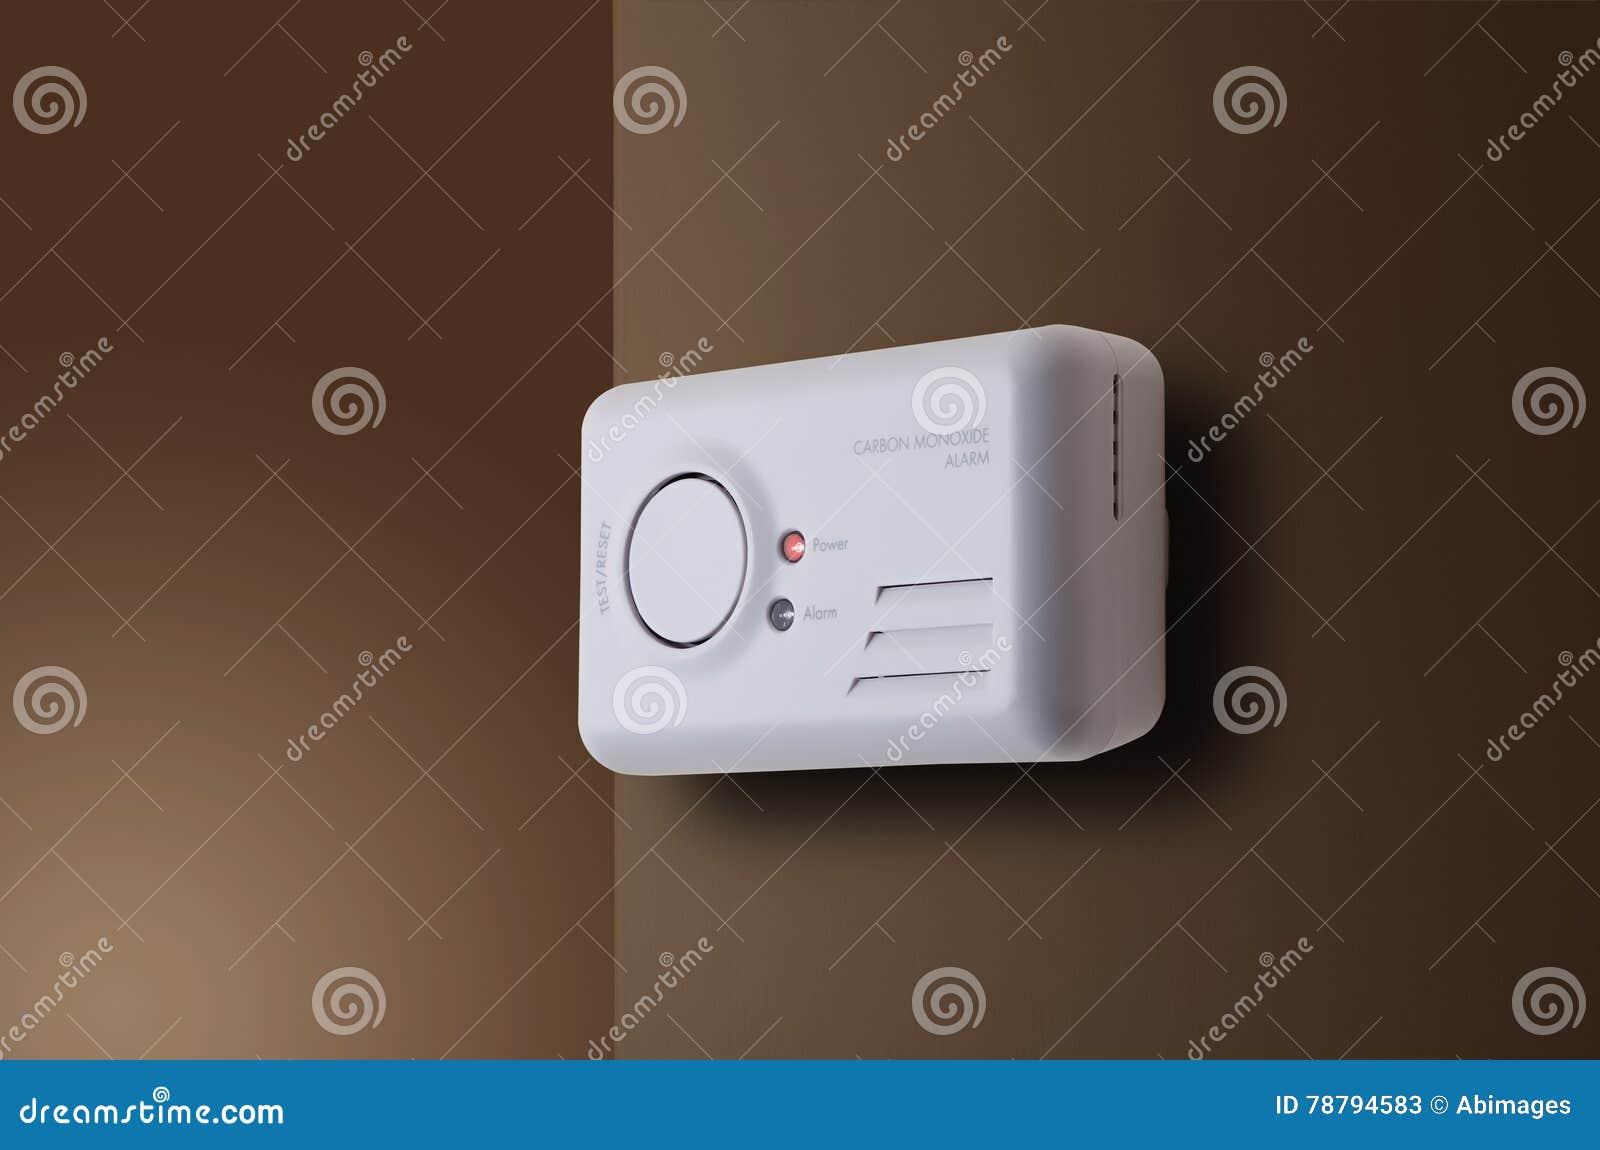 carbon monoxide alarm stock photo image 78794583. Black Bedroom Furniture Sets. Home Design Ideas